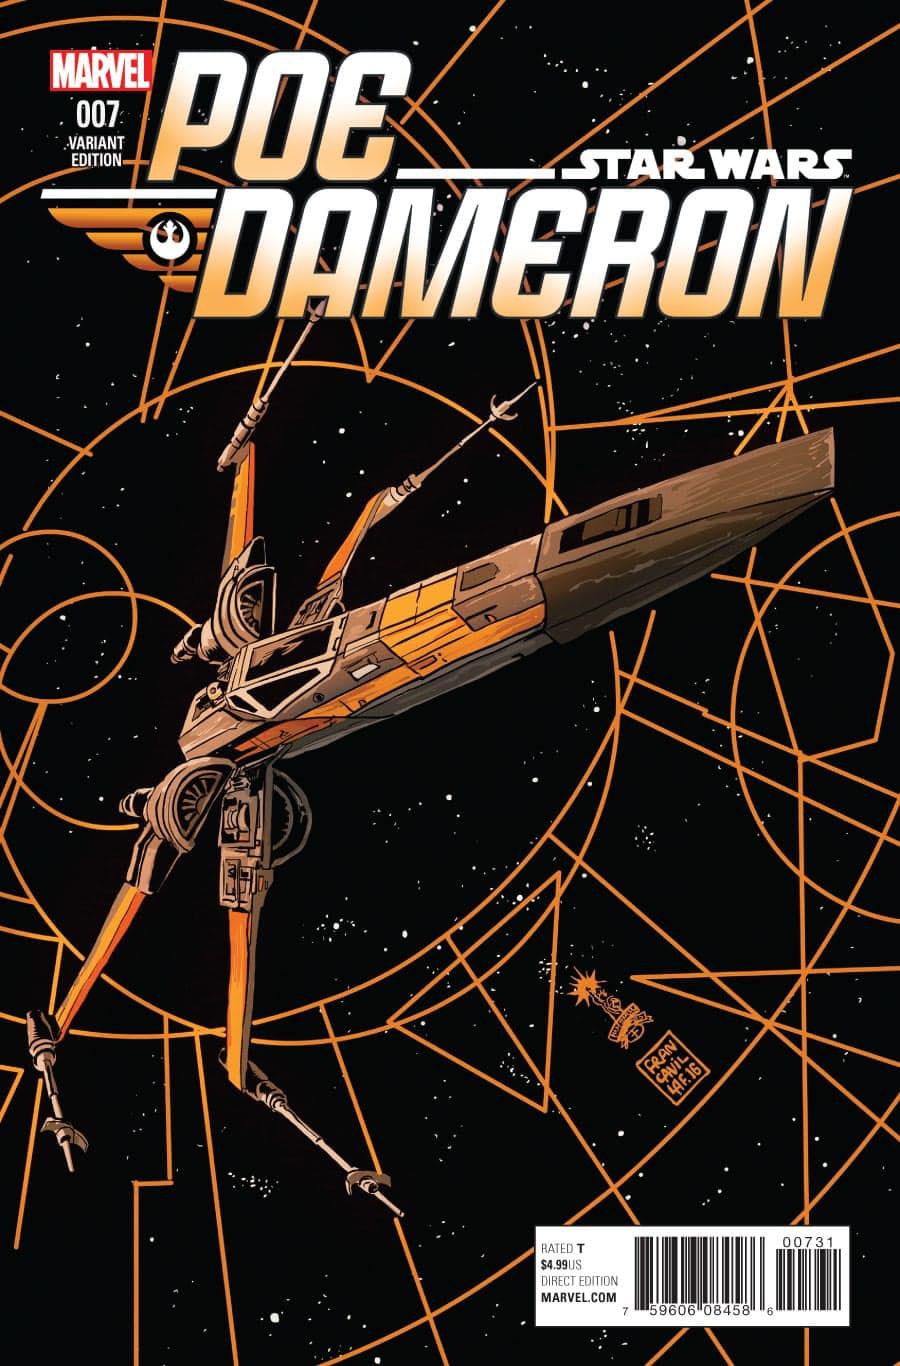 Poe Dameron Vol 1 7 X-Wing Variant.jpg